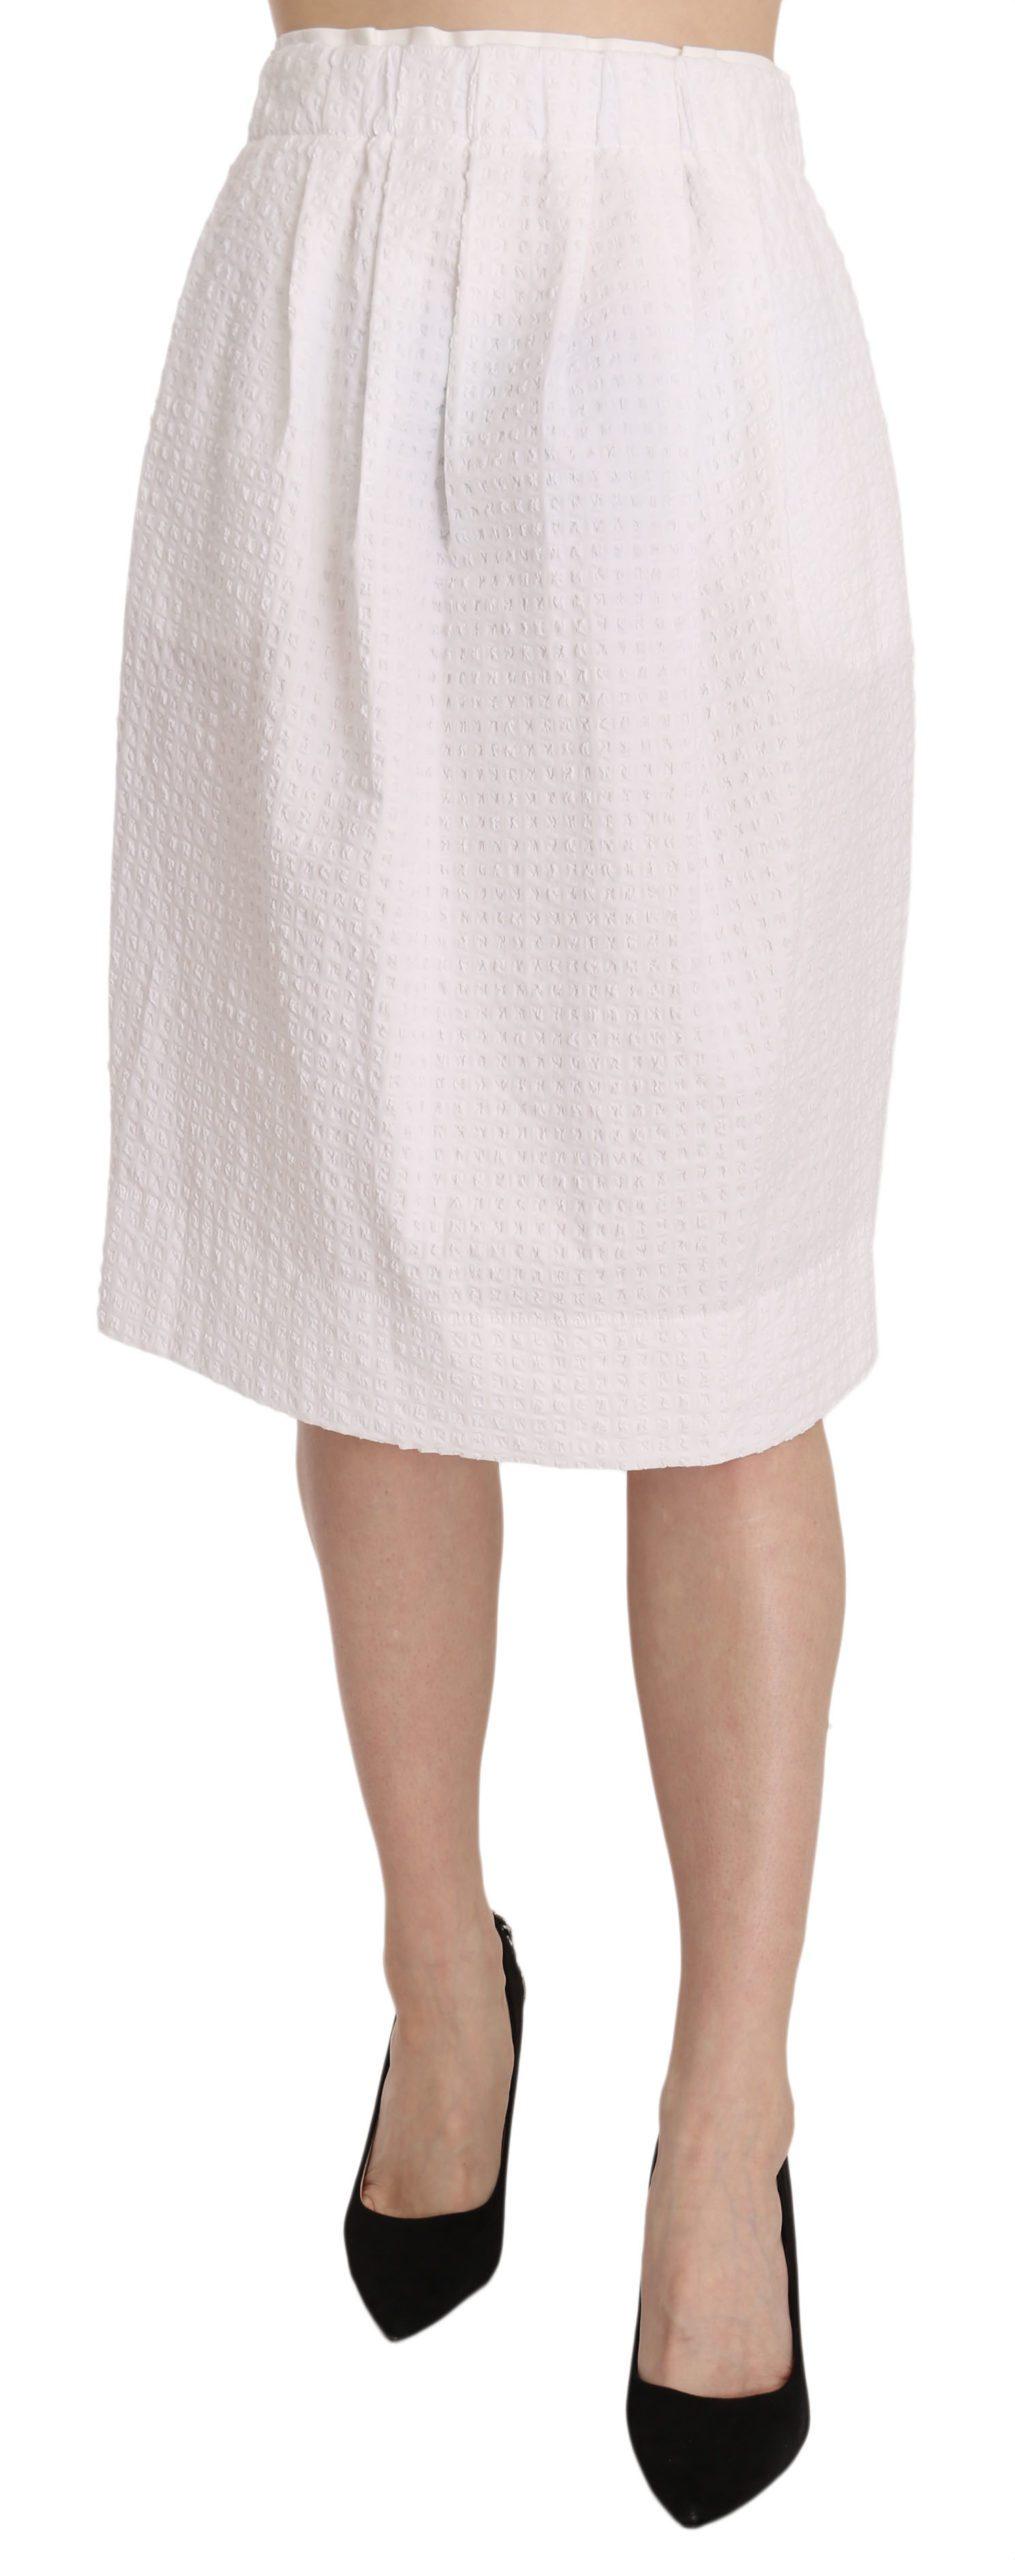 White Jacquard Plain Weave Stretch Midi Skirt - IT40 S